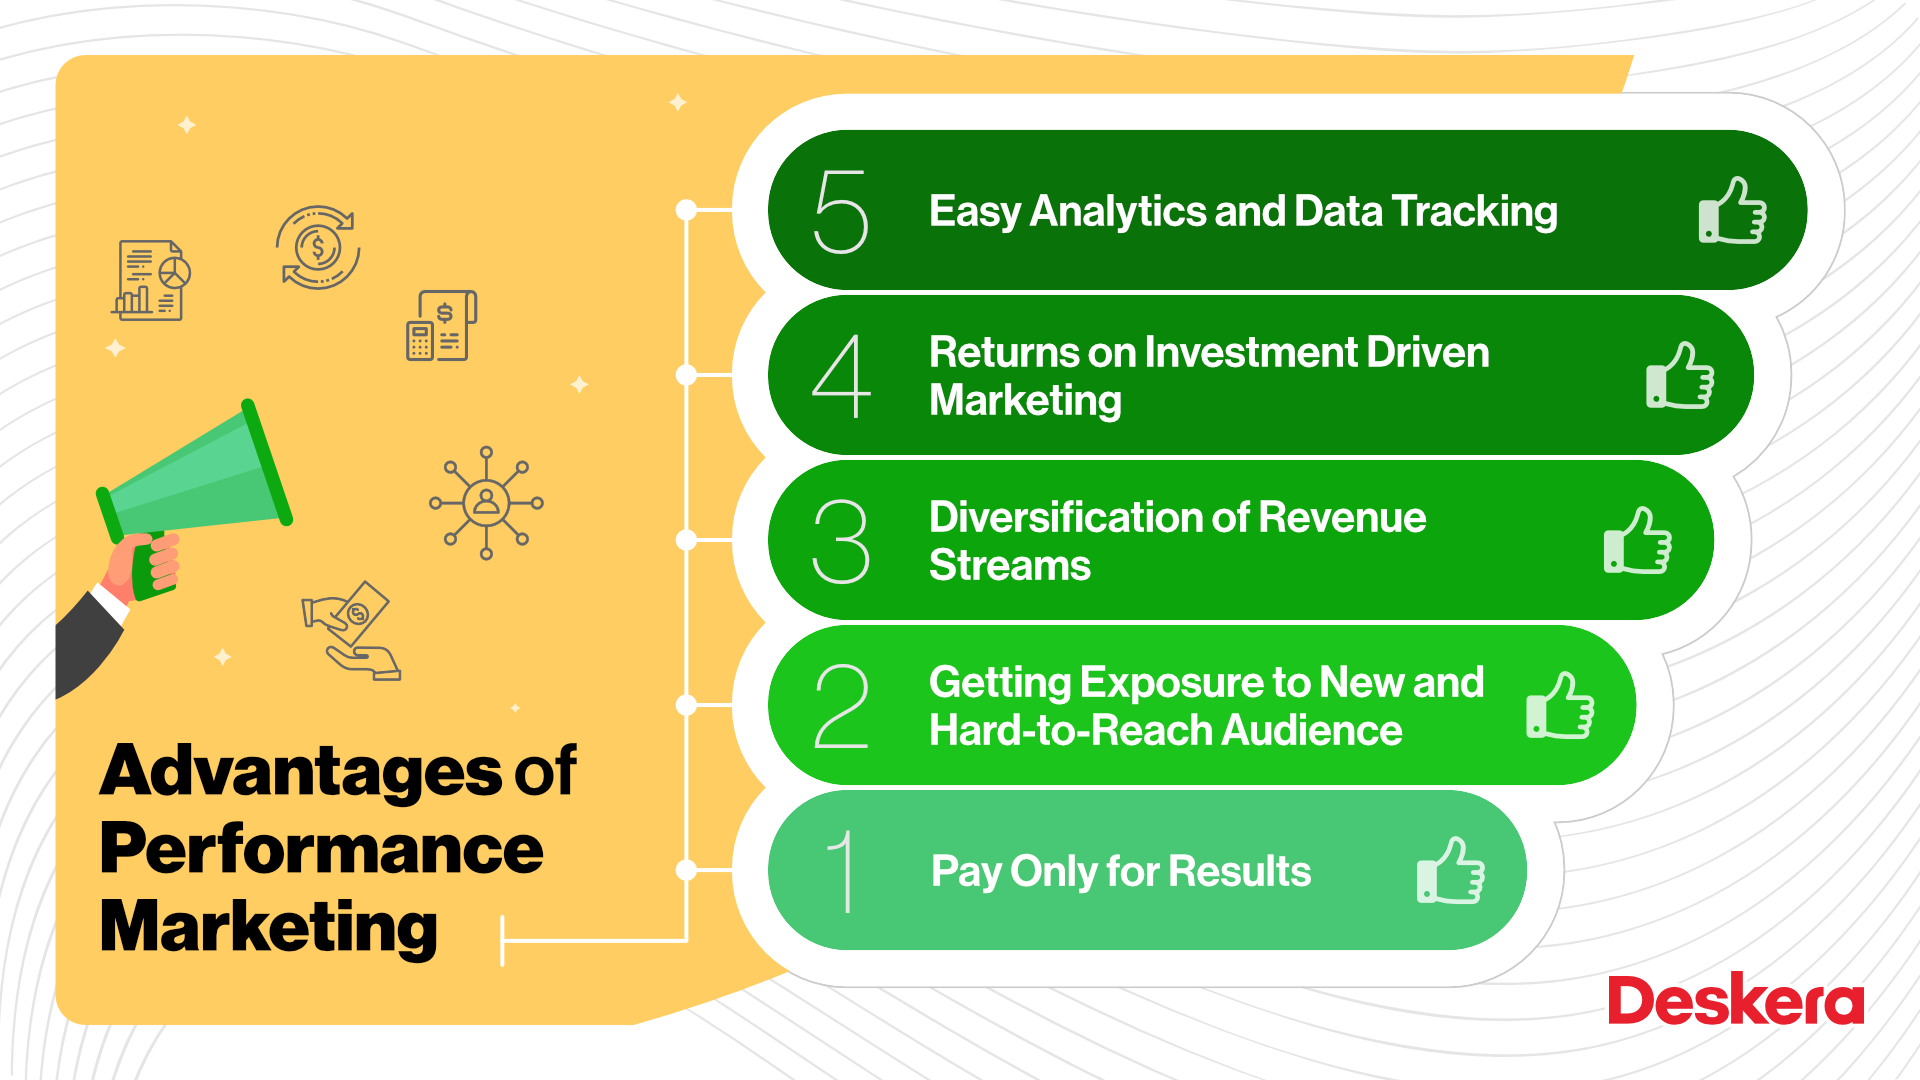 Advantages of Performance Marketing